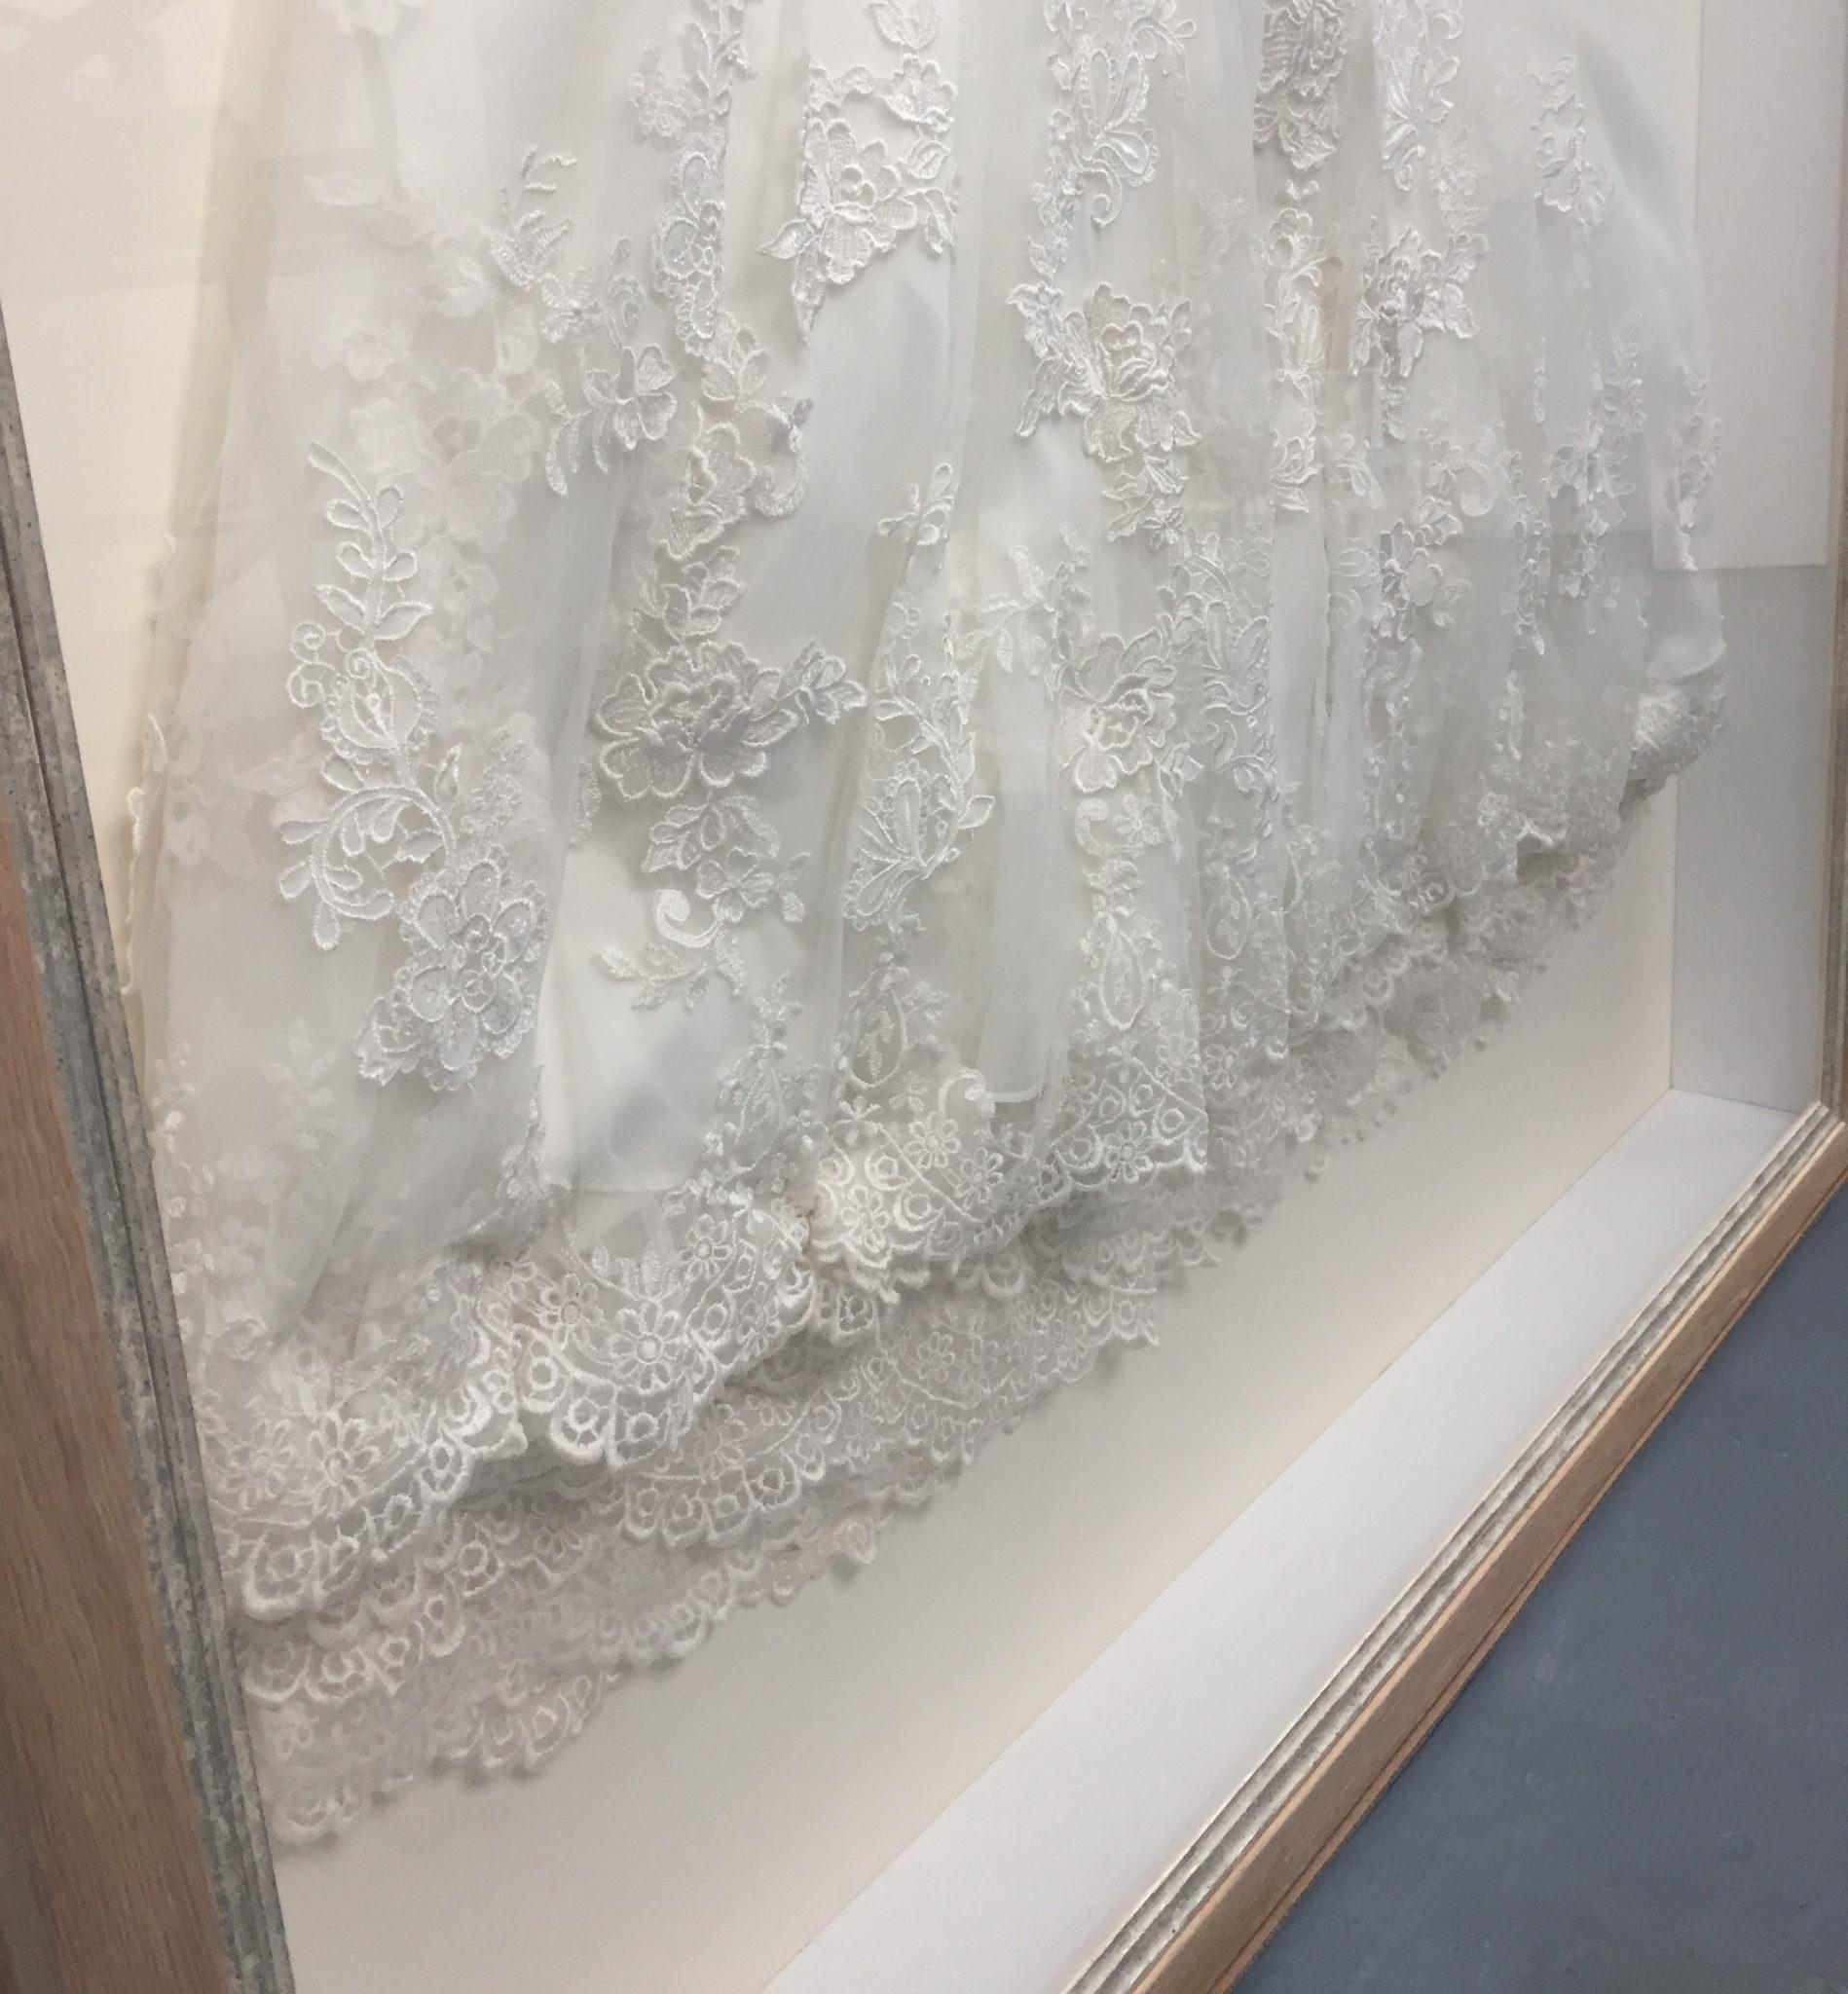 Wedding Dress Framing - Ironbridge Fine Arts & Framing